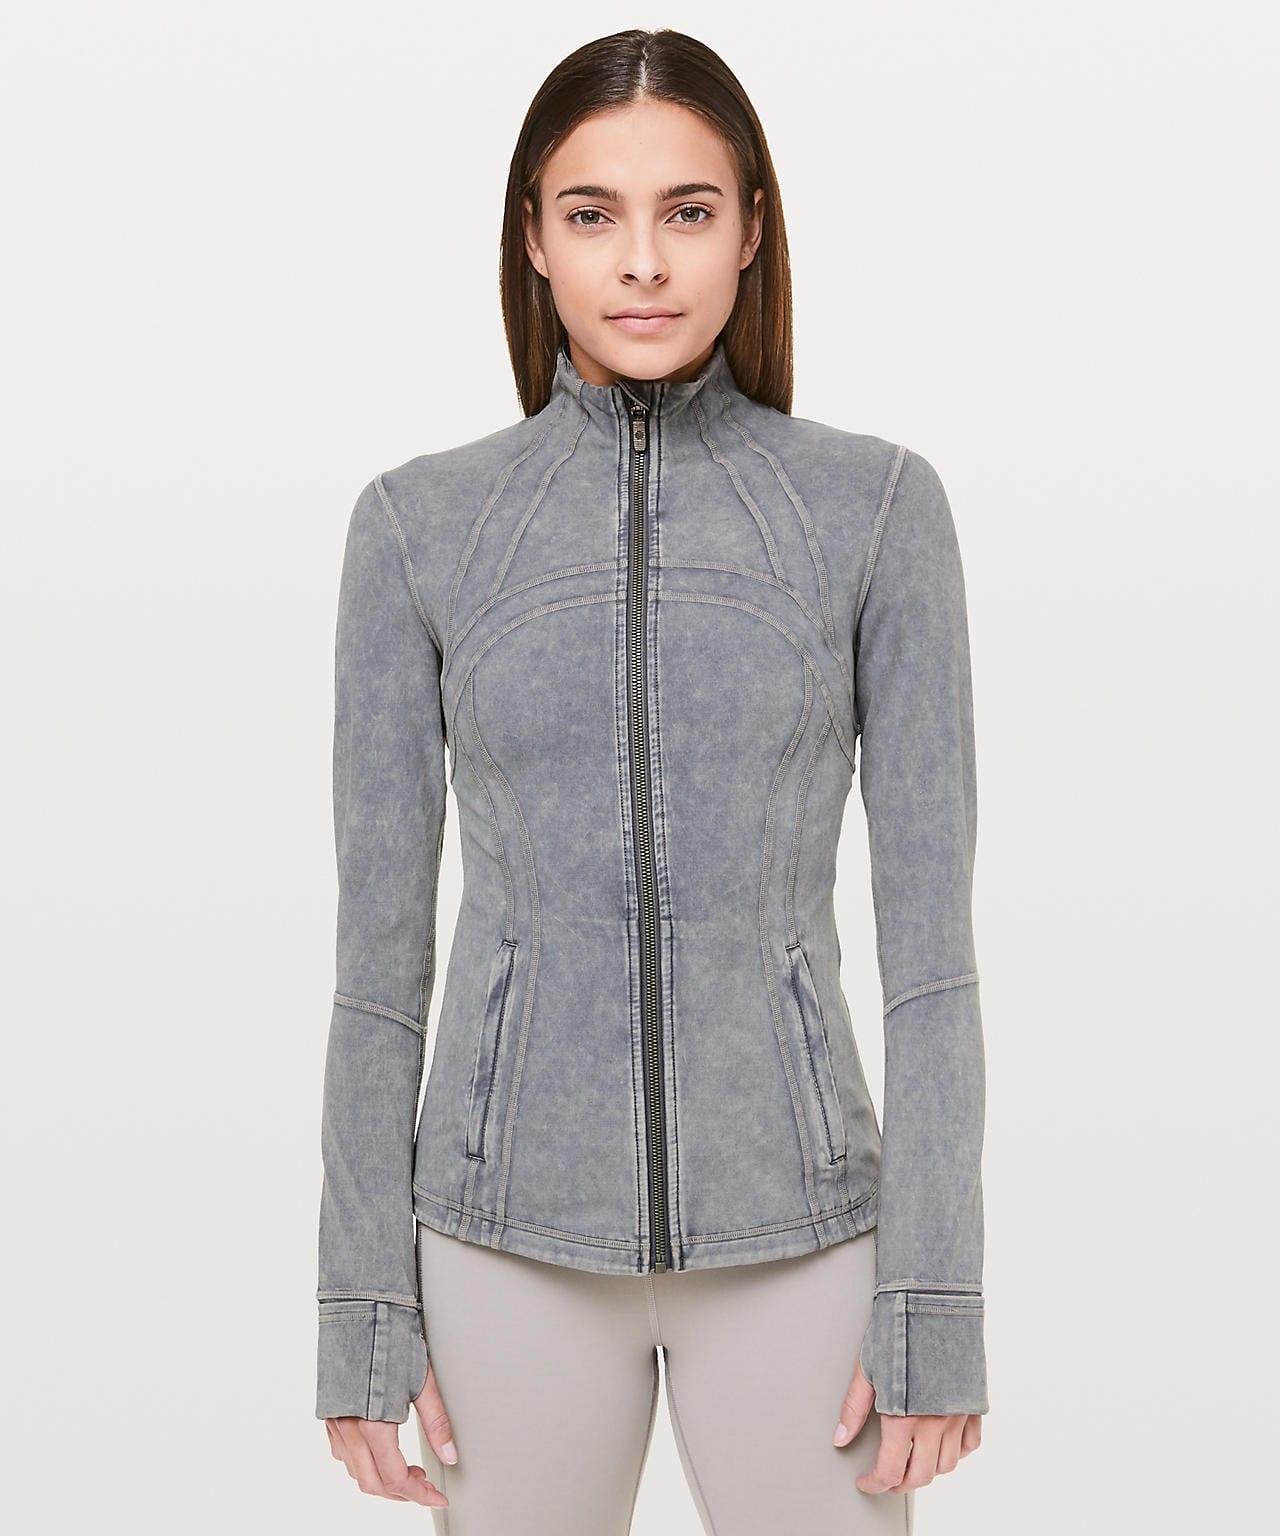 Define Jacket Garment Dye